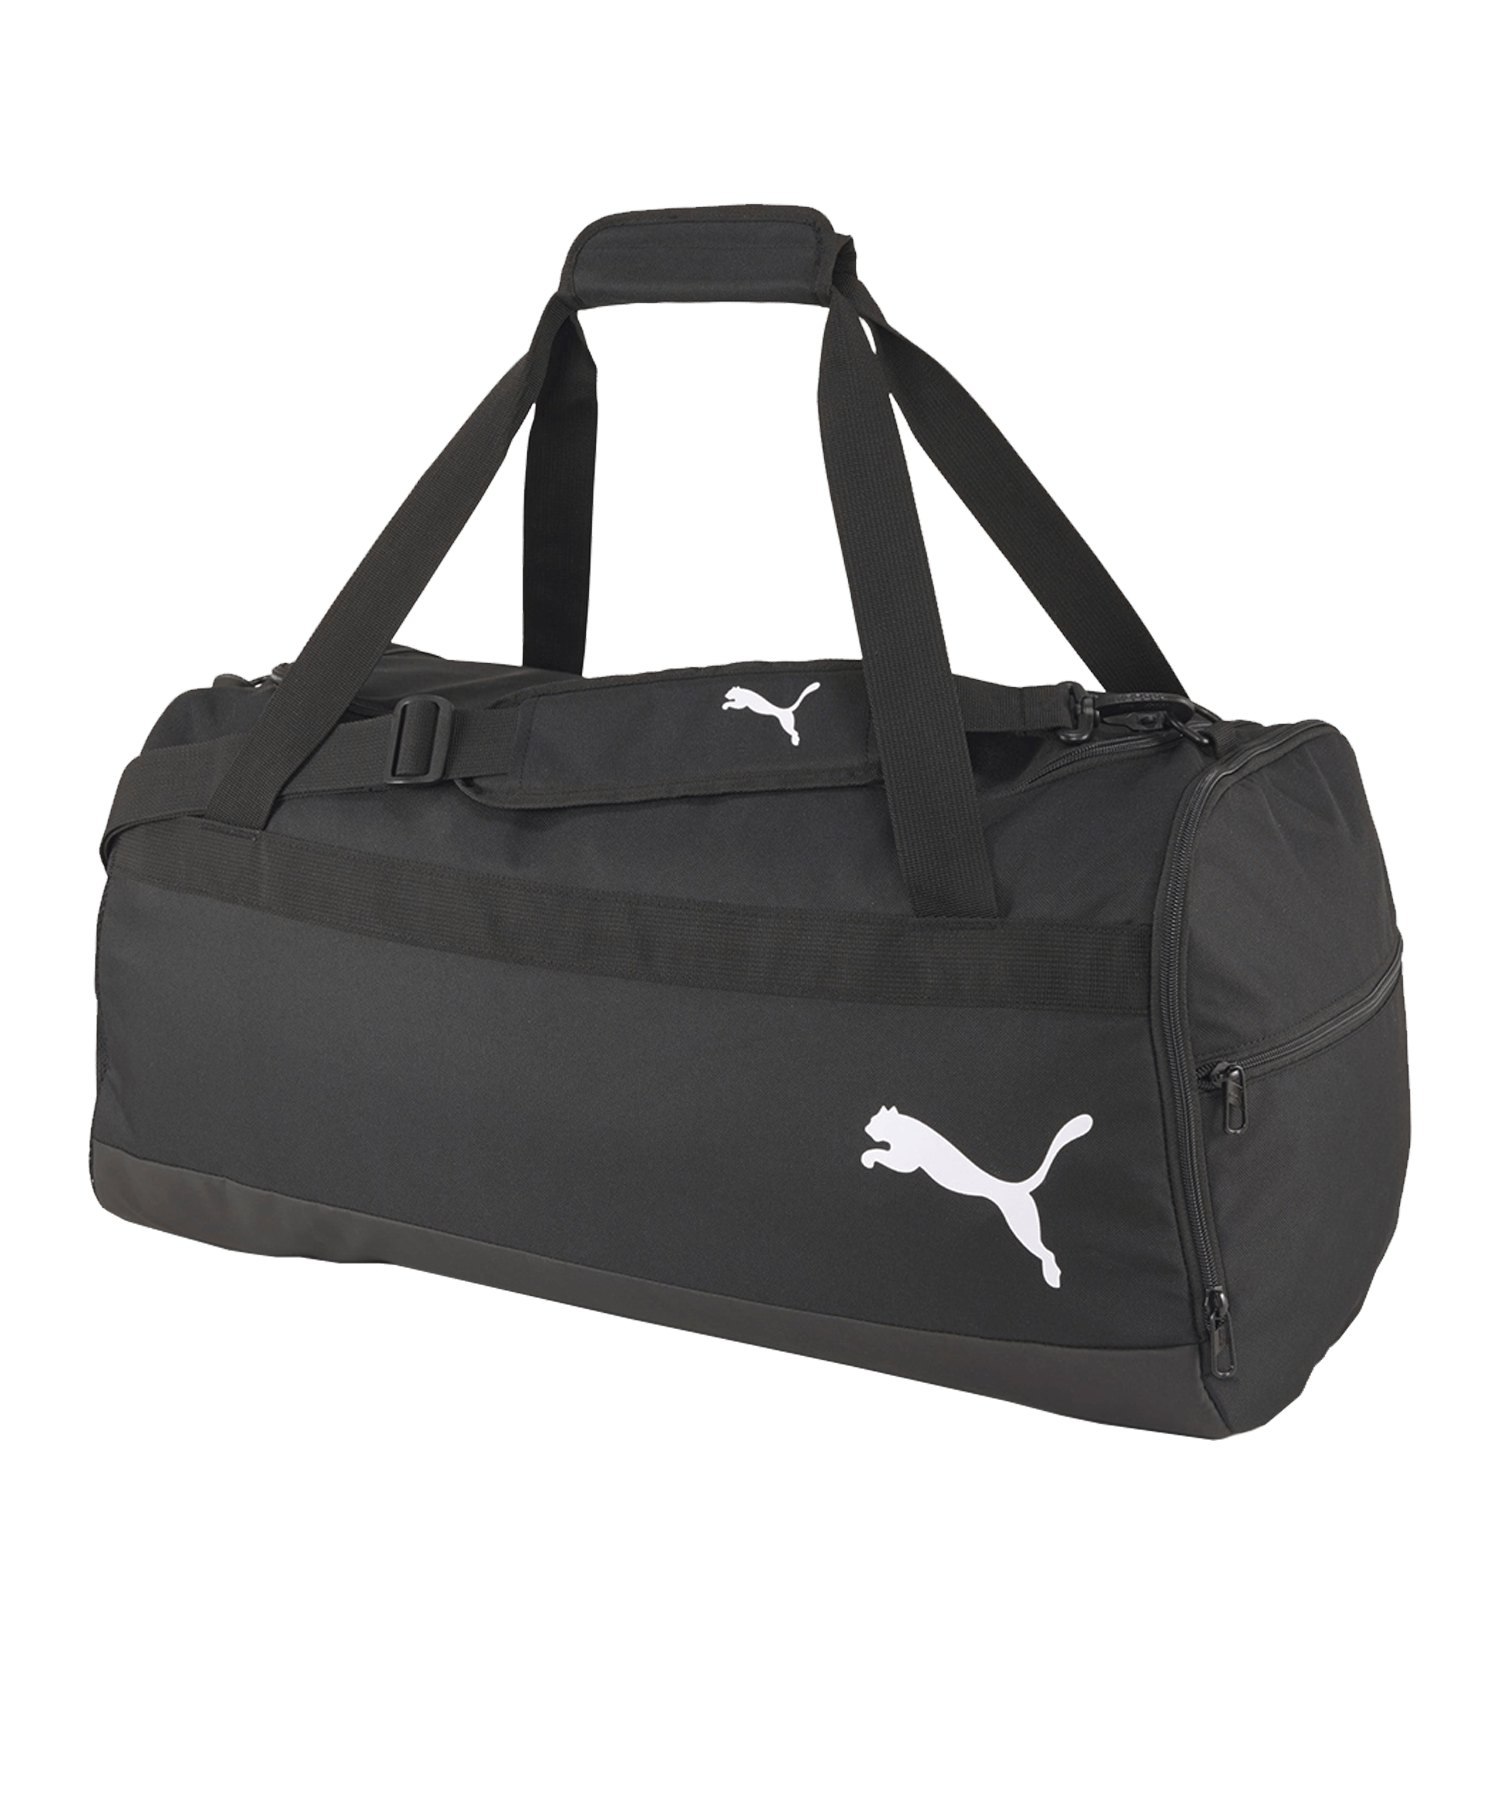 PUMA teamGOAL 23 Teambag Sporttasche Gr. M F03 - schwarz